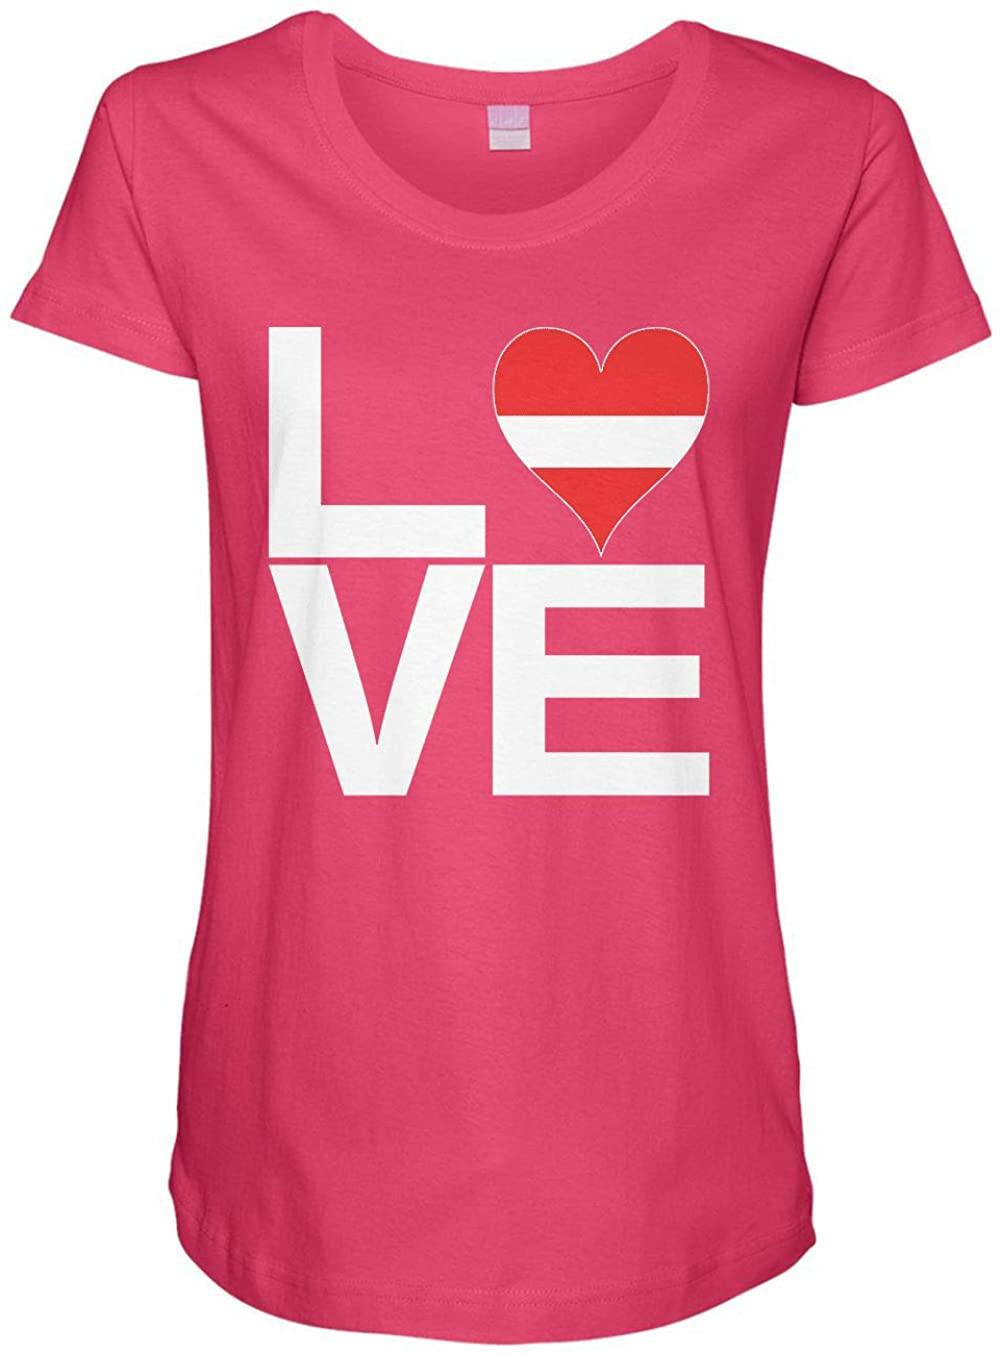 HARD EDGE DESIGN Ladies Love Block Latvia Heart Maternity Tee, 3X-Large, Hot Pink